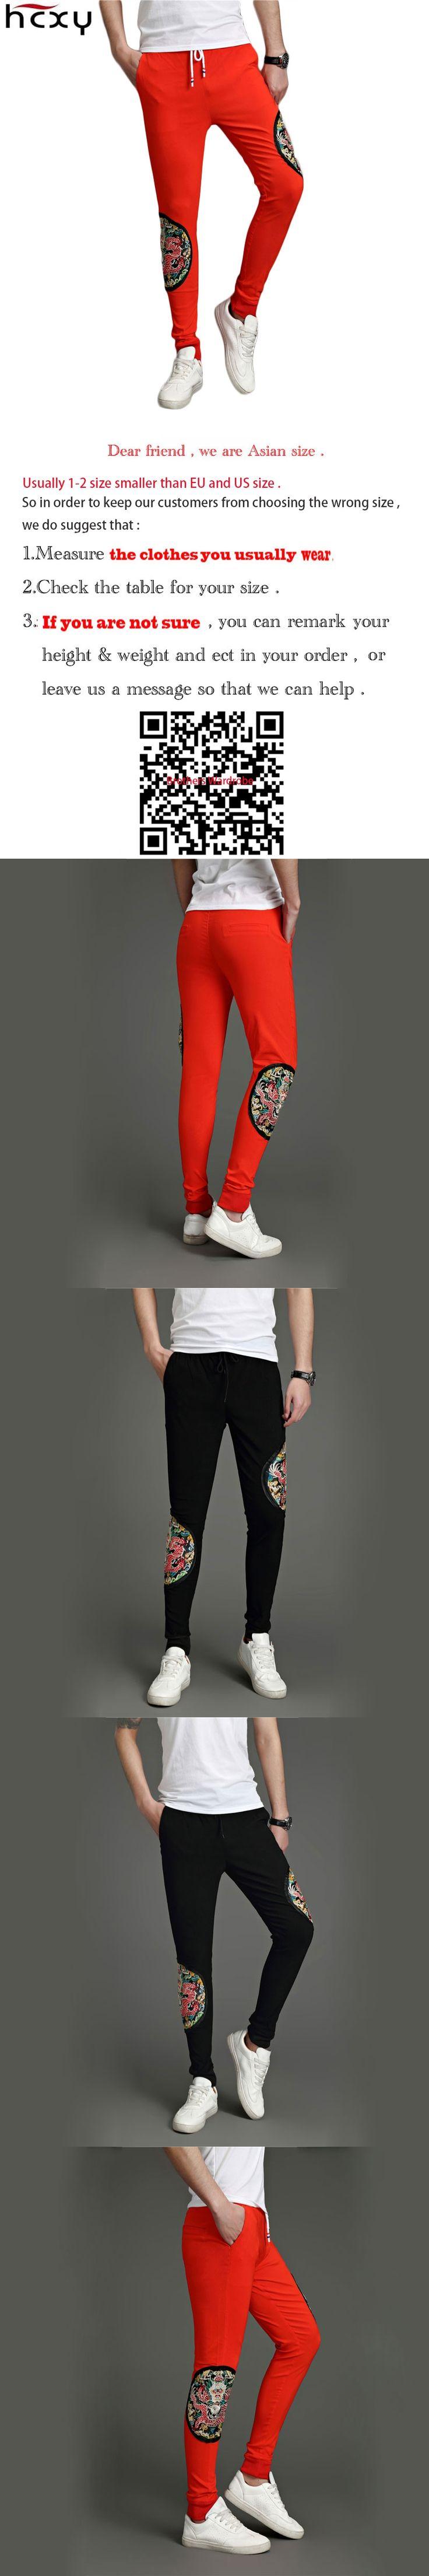 2017 New Design Casual Men pants Cotton Slim Pant Straight Trousers Fashion Nightclub Pants Men's casual pants